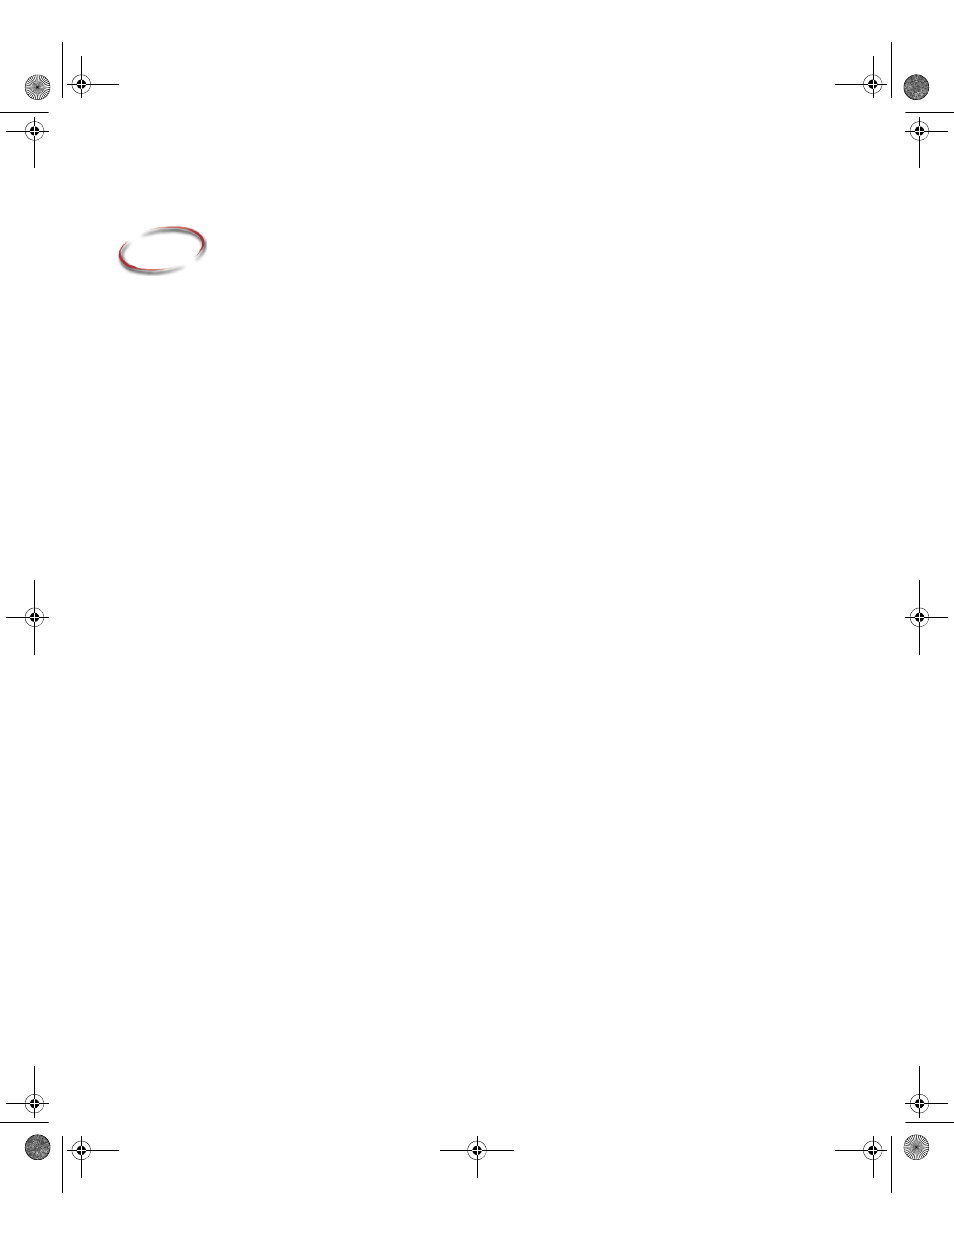 Factorytalk view basics, What is factorytalk view se, 1